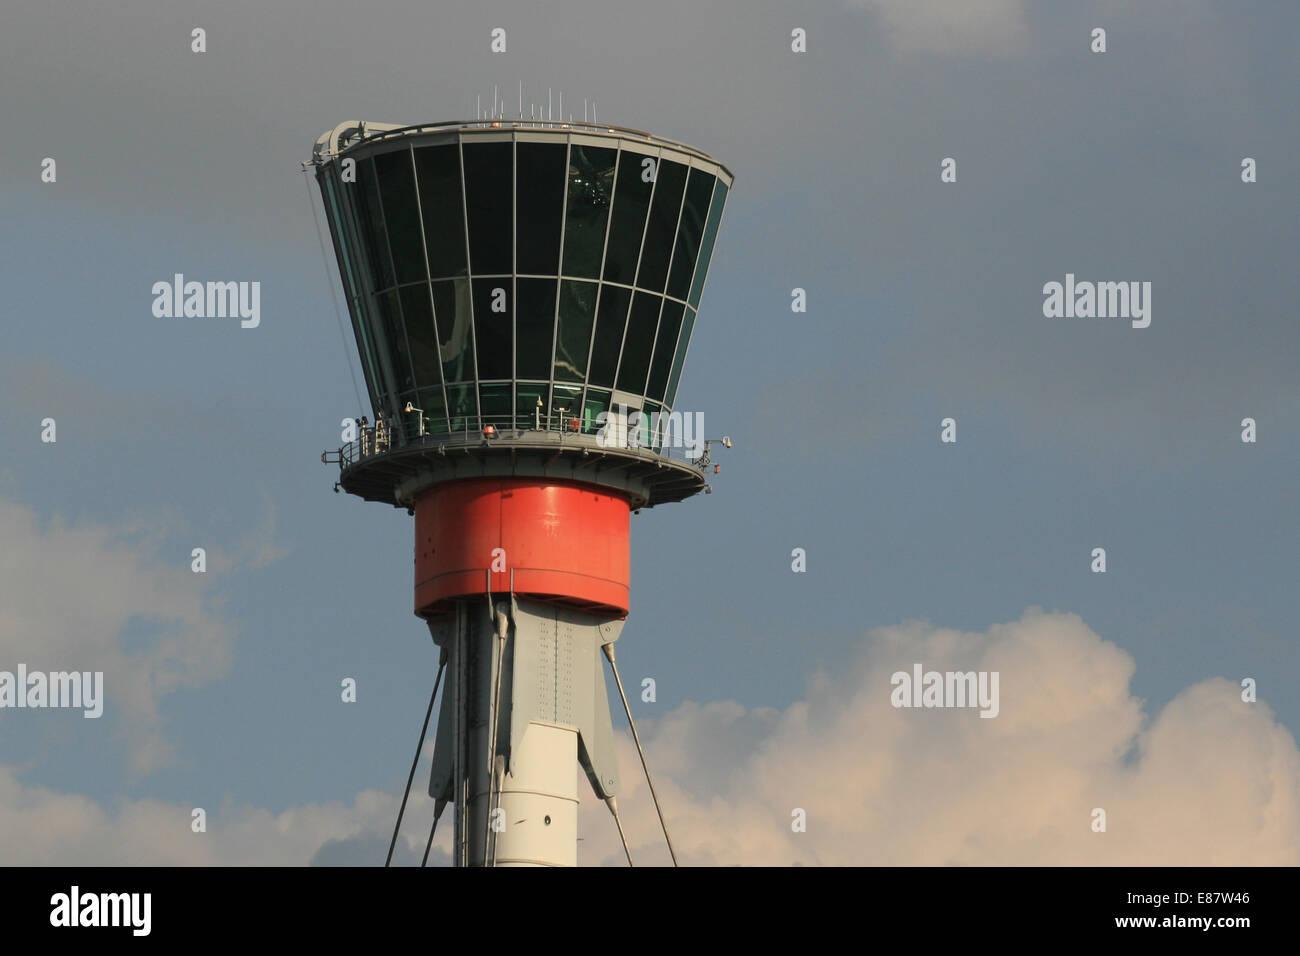 ATC CONTROL TOWER LHR HEATHROW - Stock Image